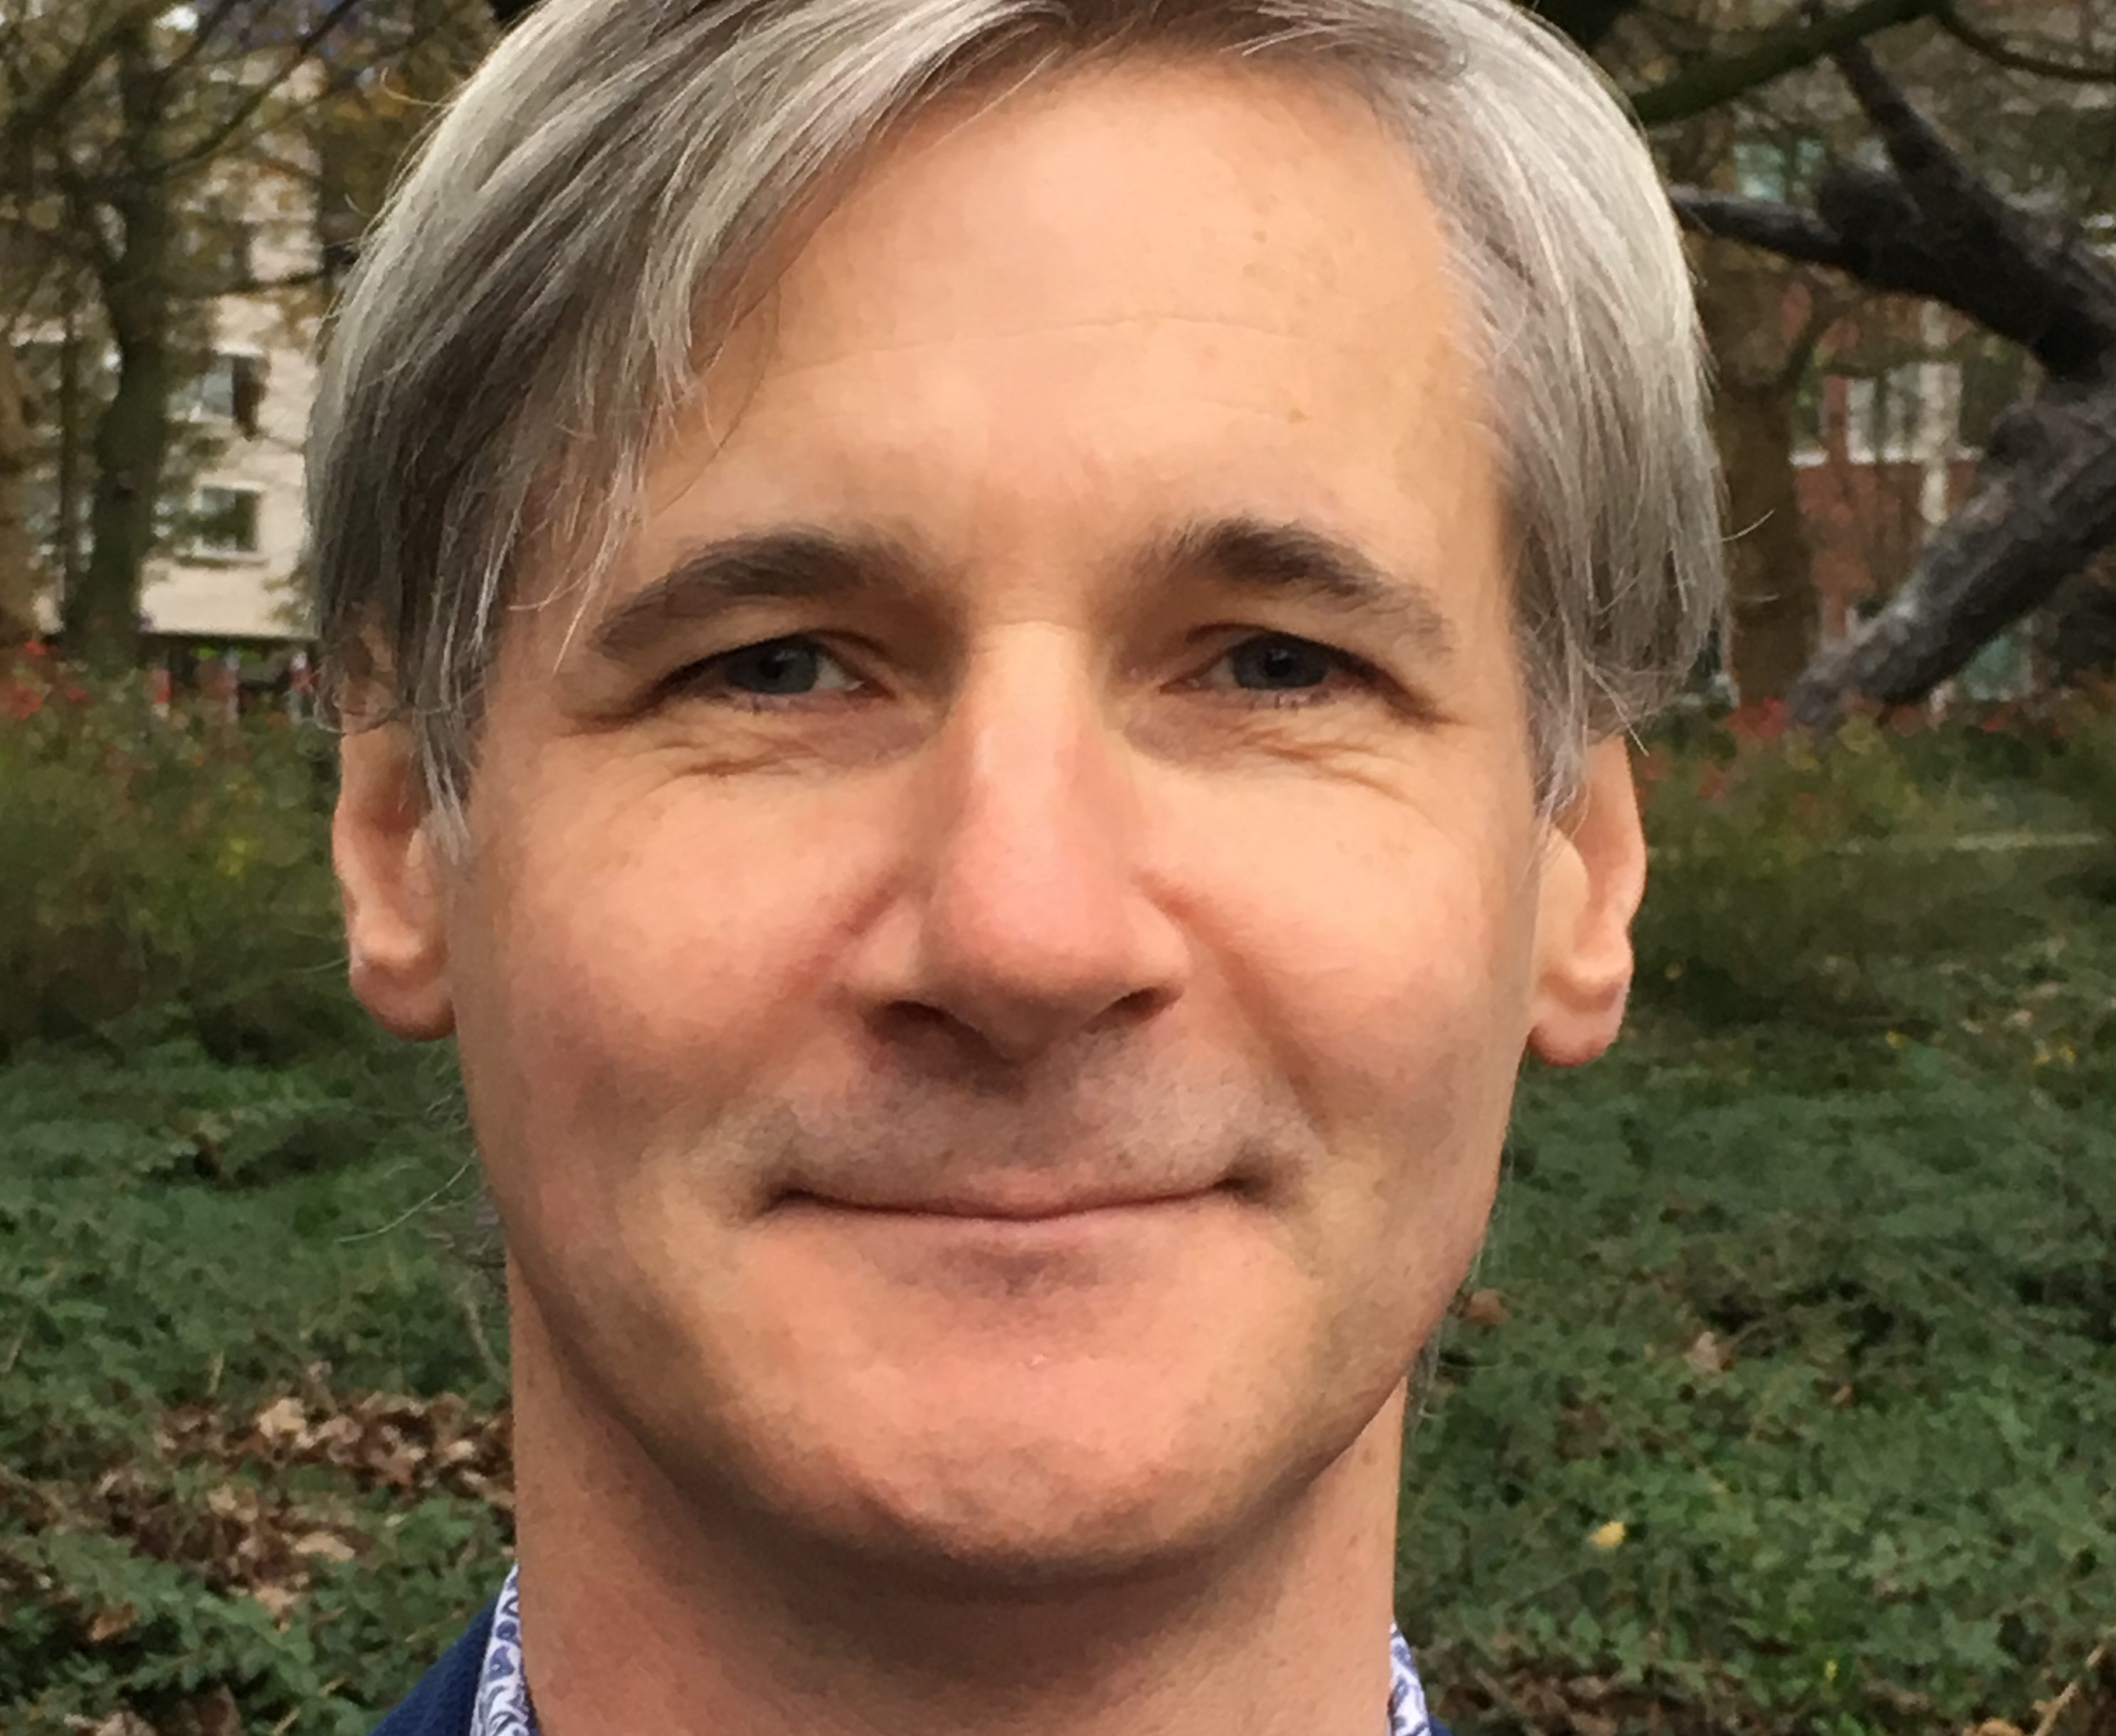 Professor Rory O'Connor of Glasgow University